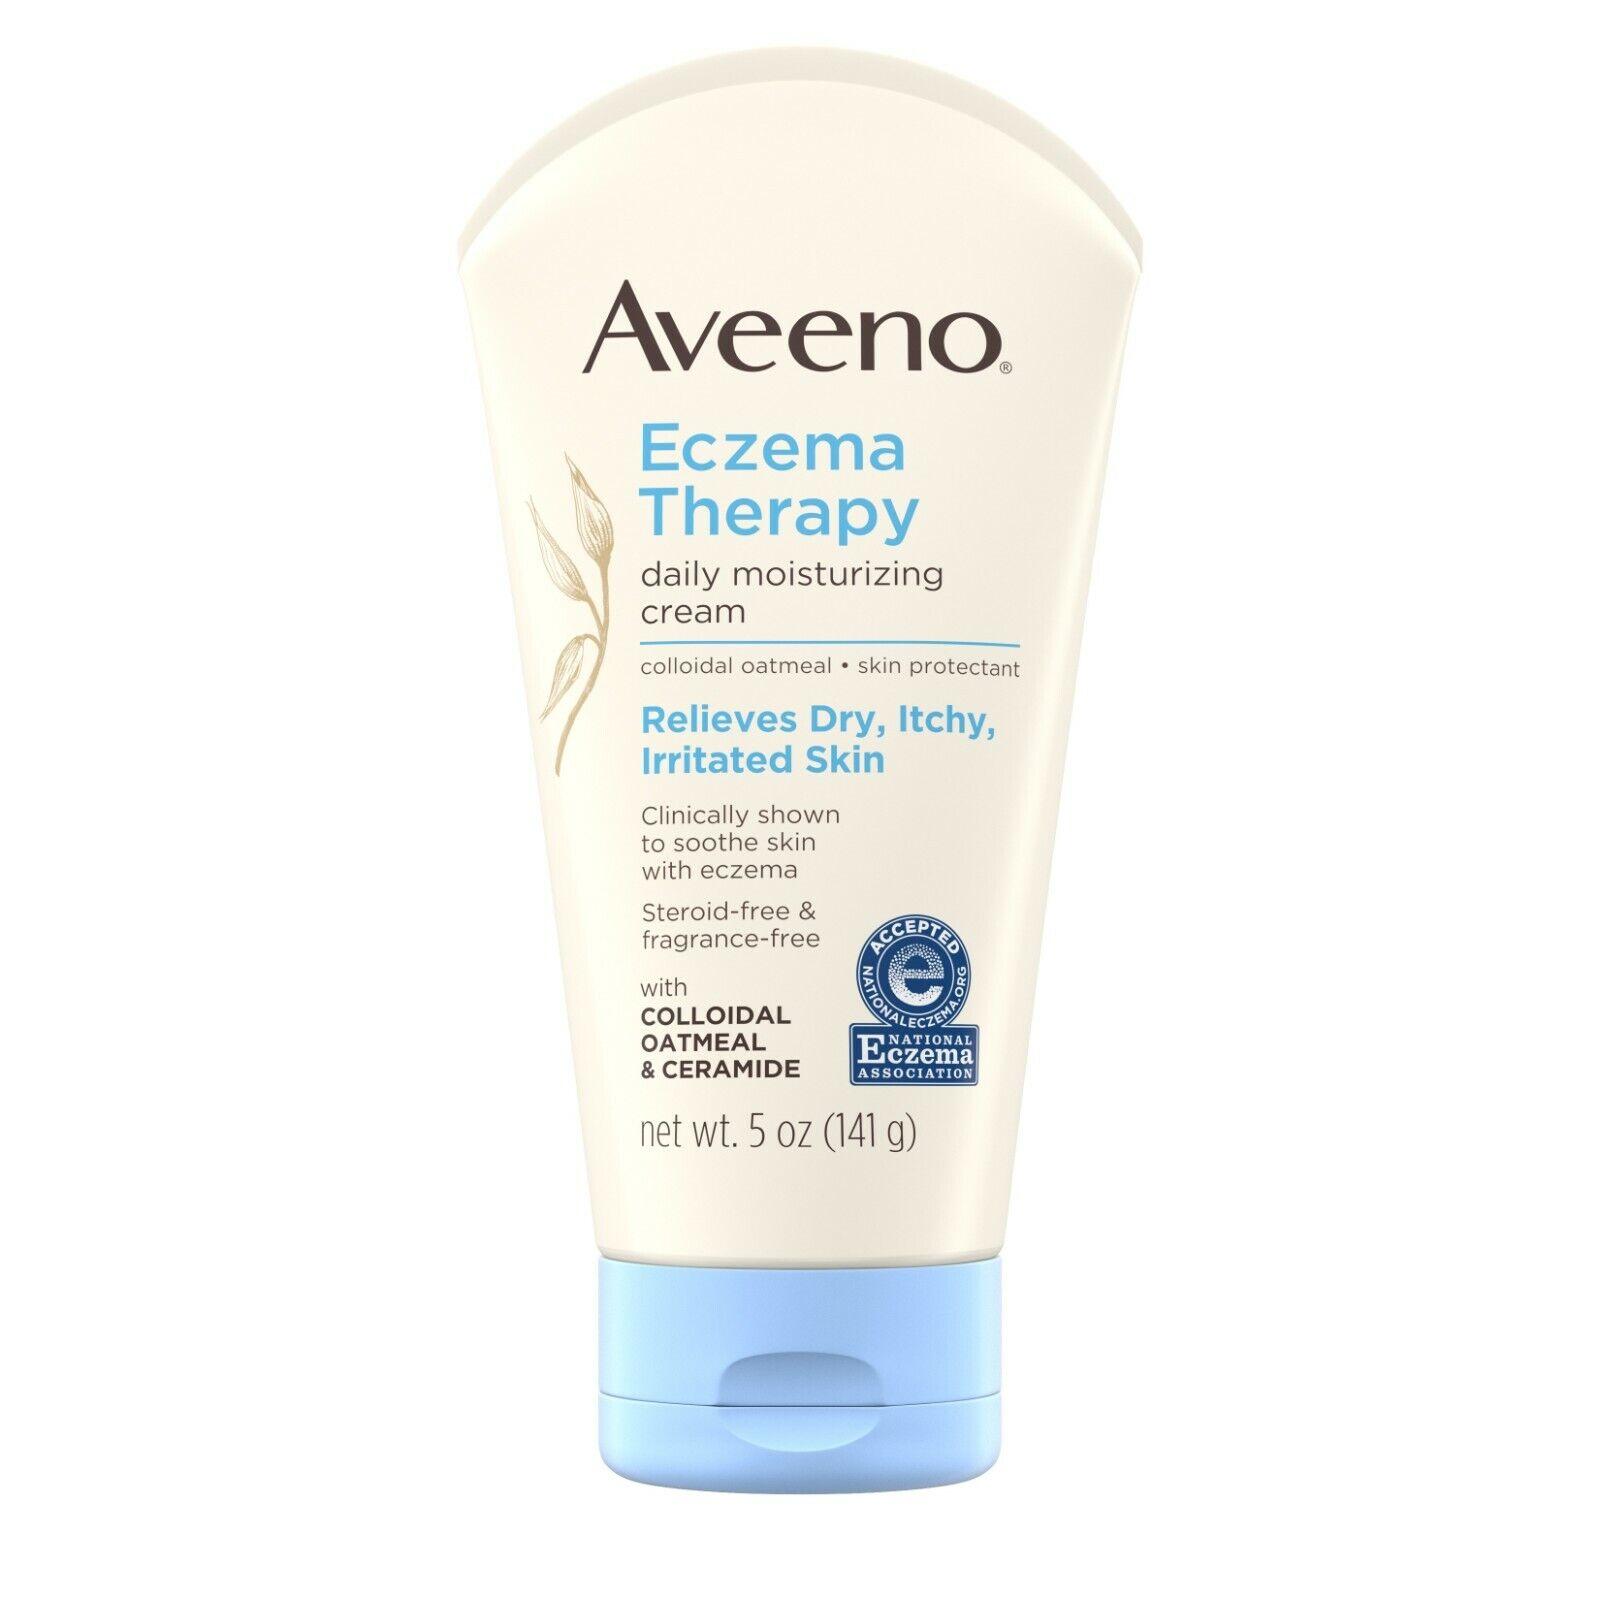 Aveeno Eczema Therapy Daily Moisturizing Cream with Oatmeal